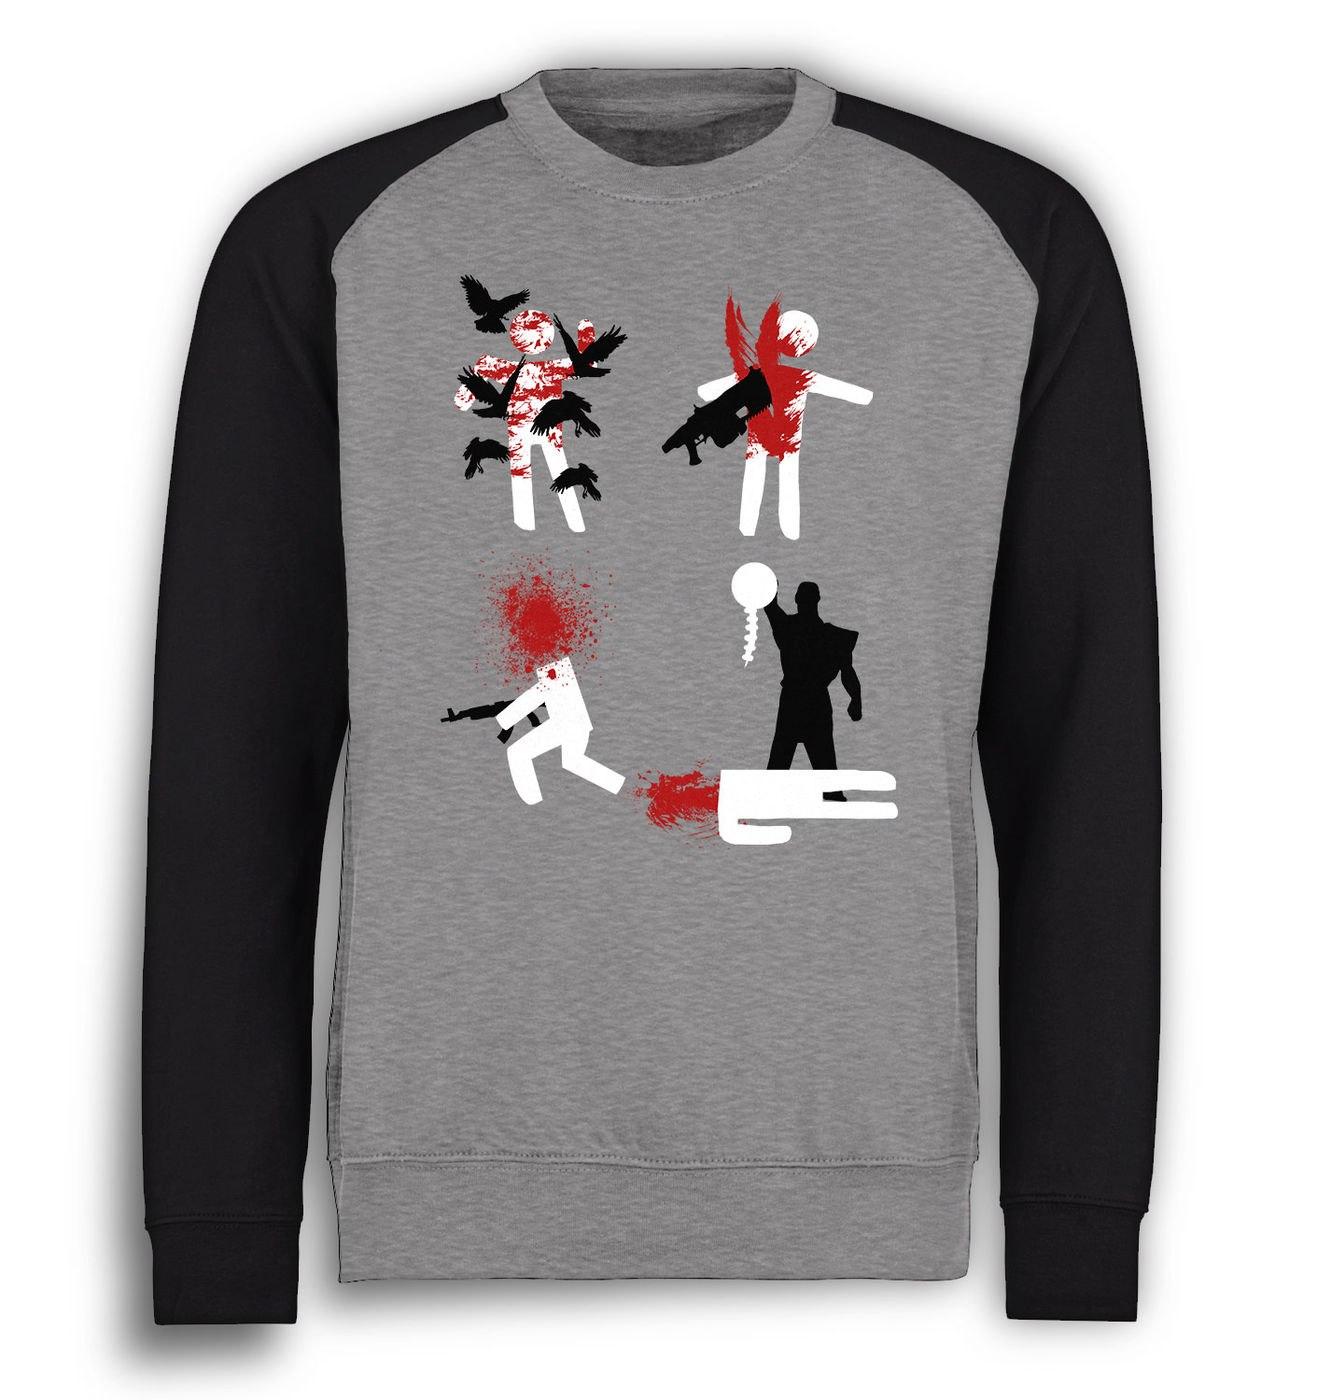 Ingame Deaths baseball sweatshirt by Something Geeky